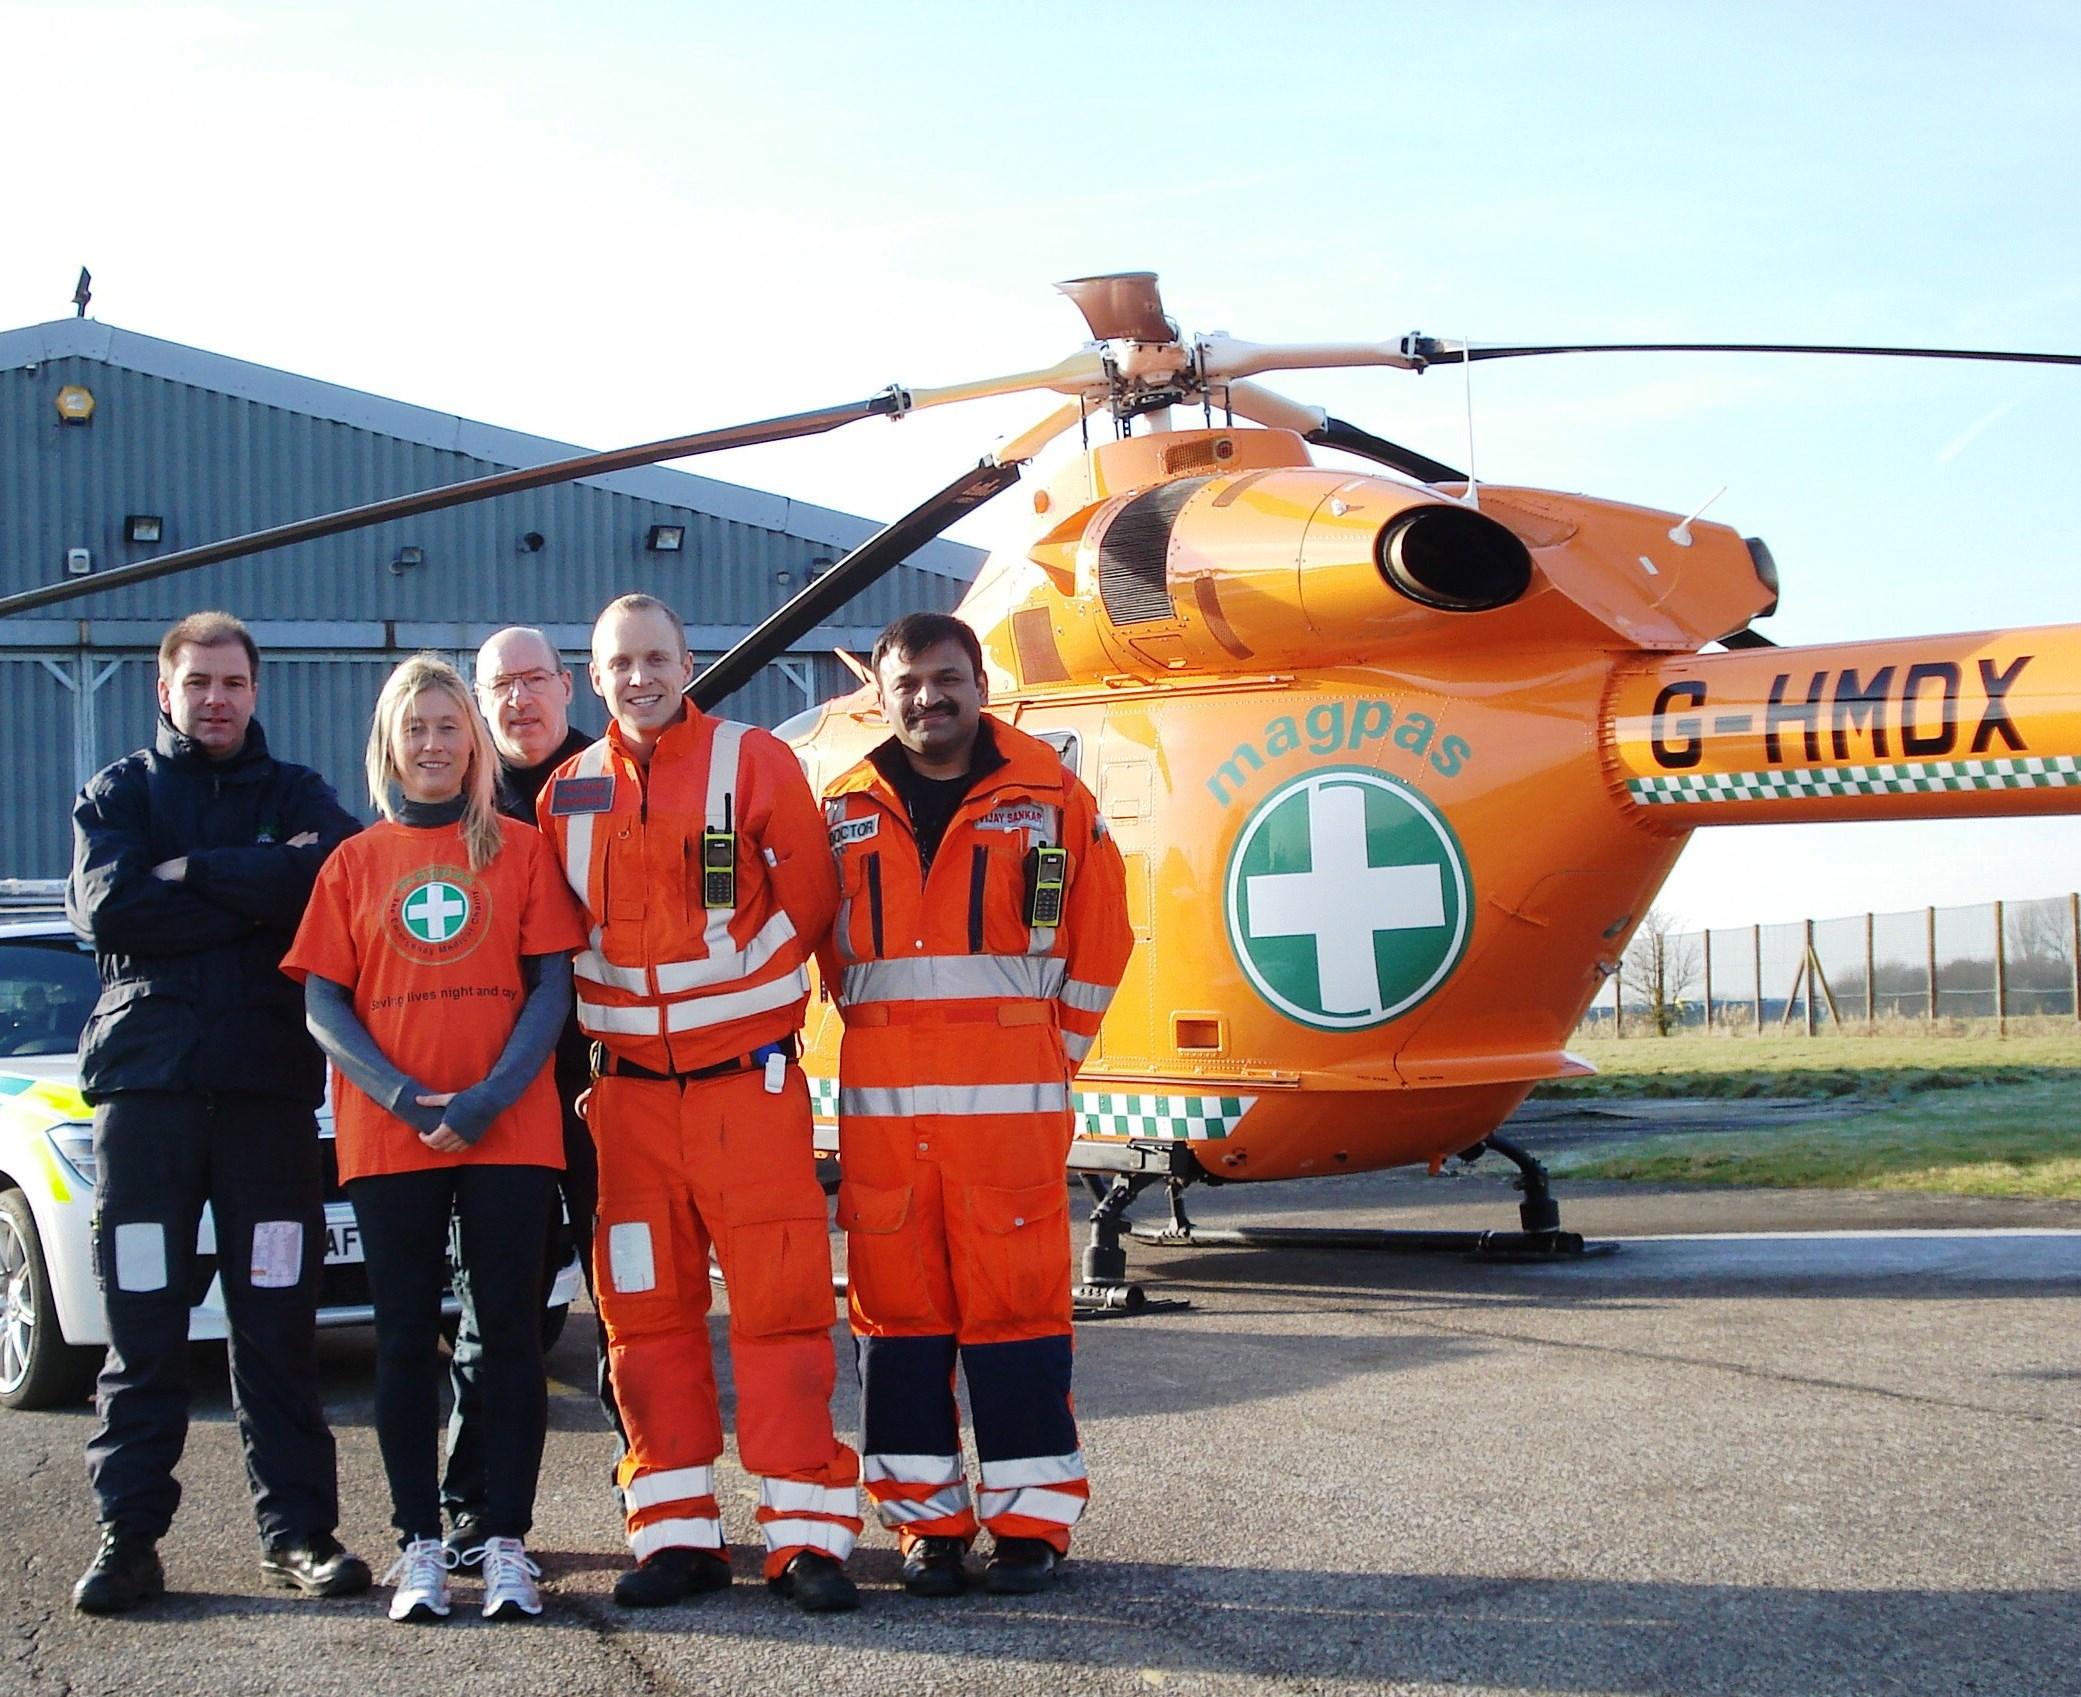 Cat-with-the-Magpas-Air-Ambulance-medical-team.jpg